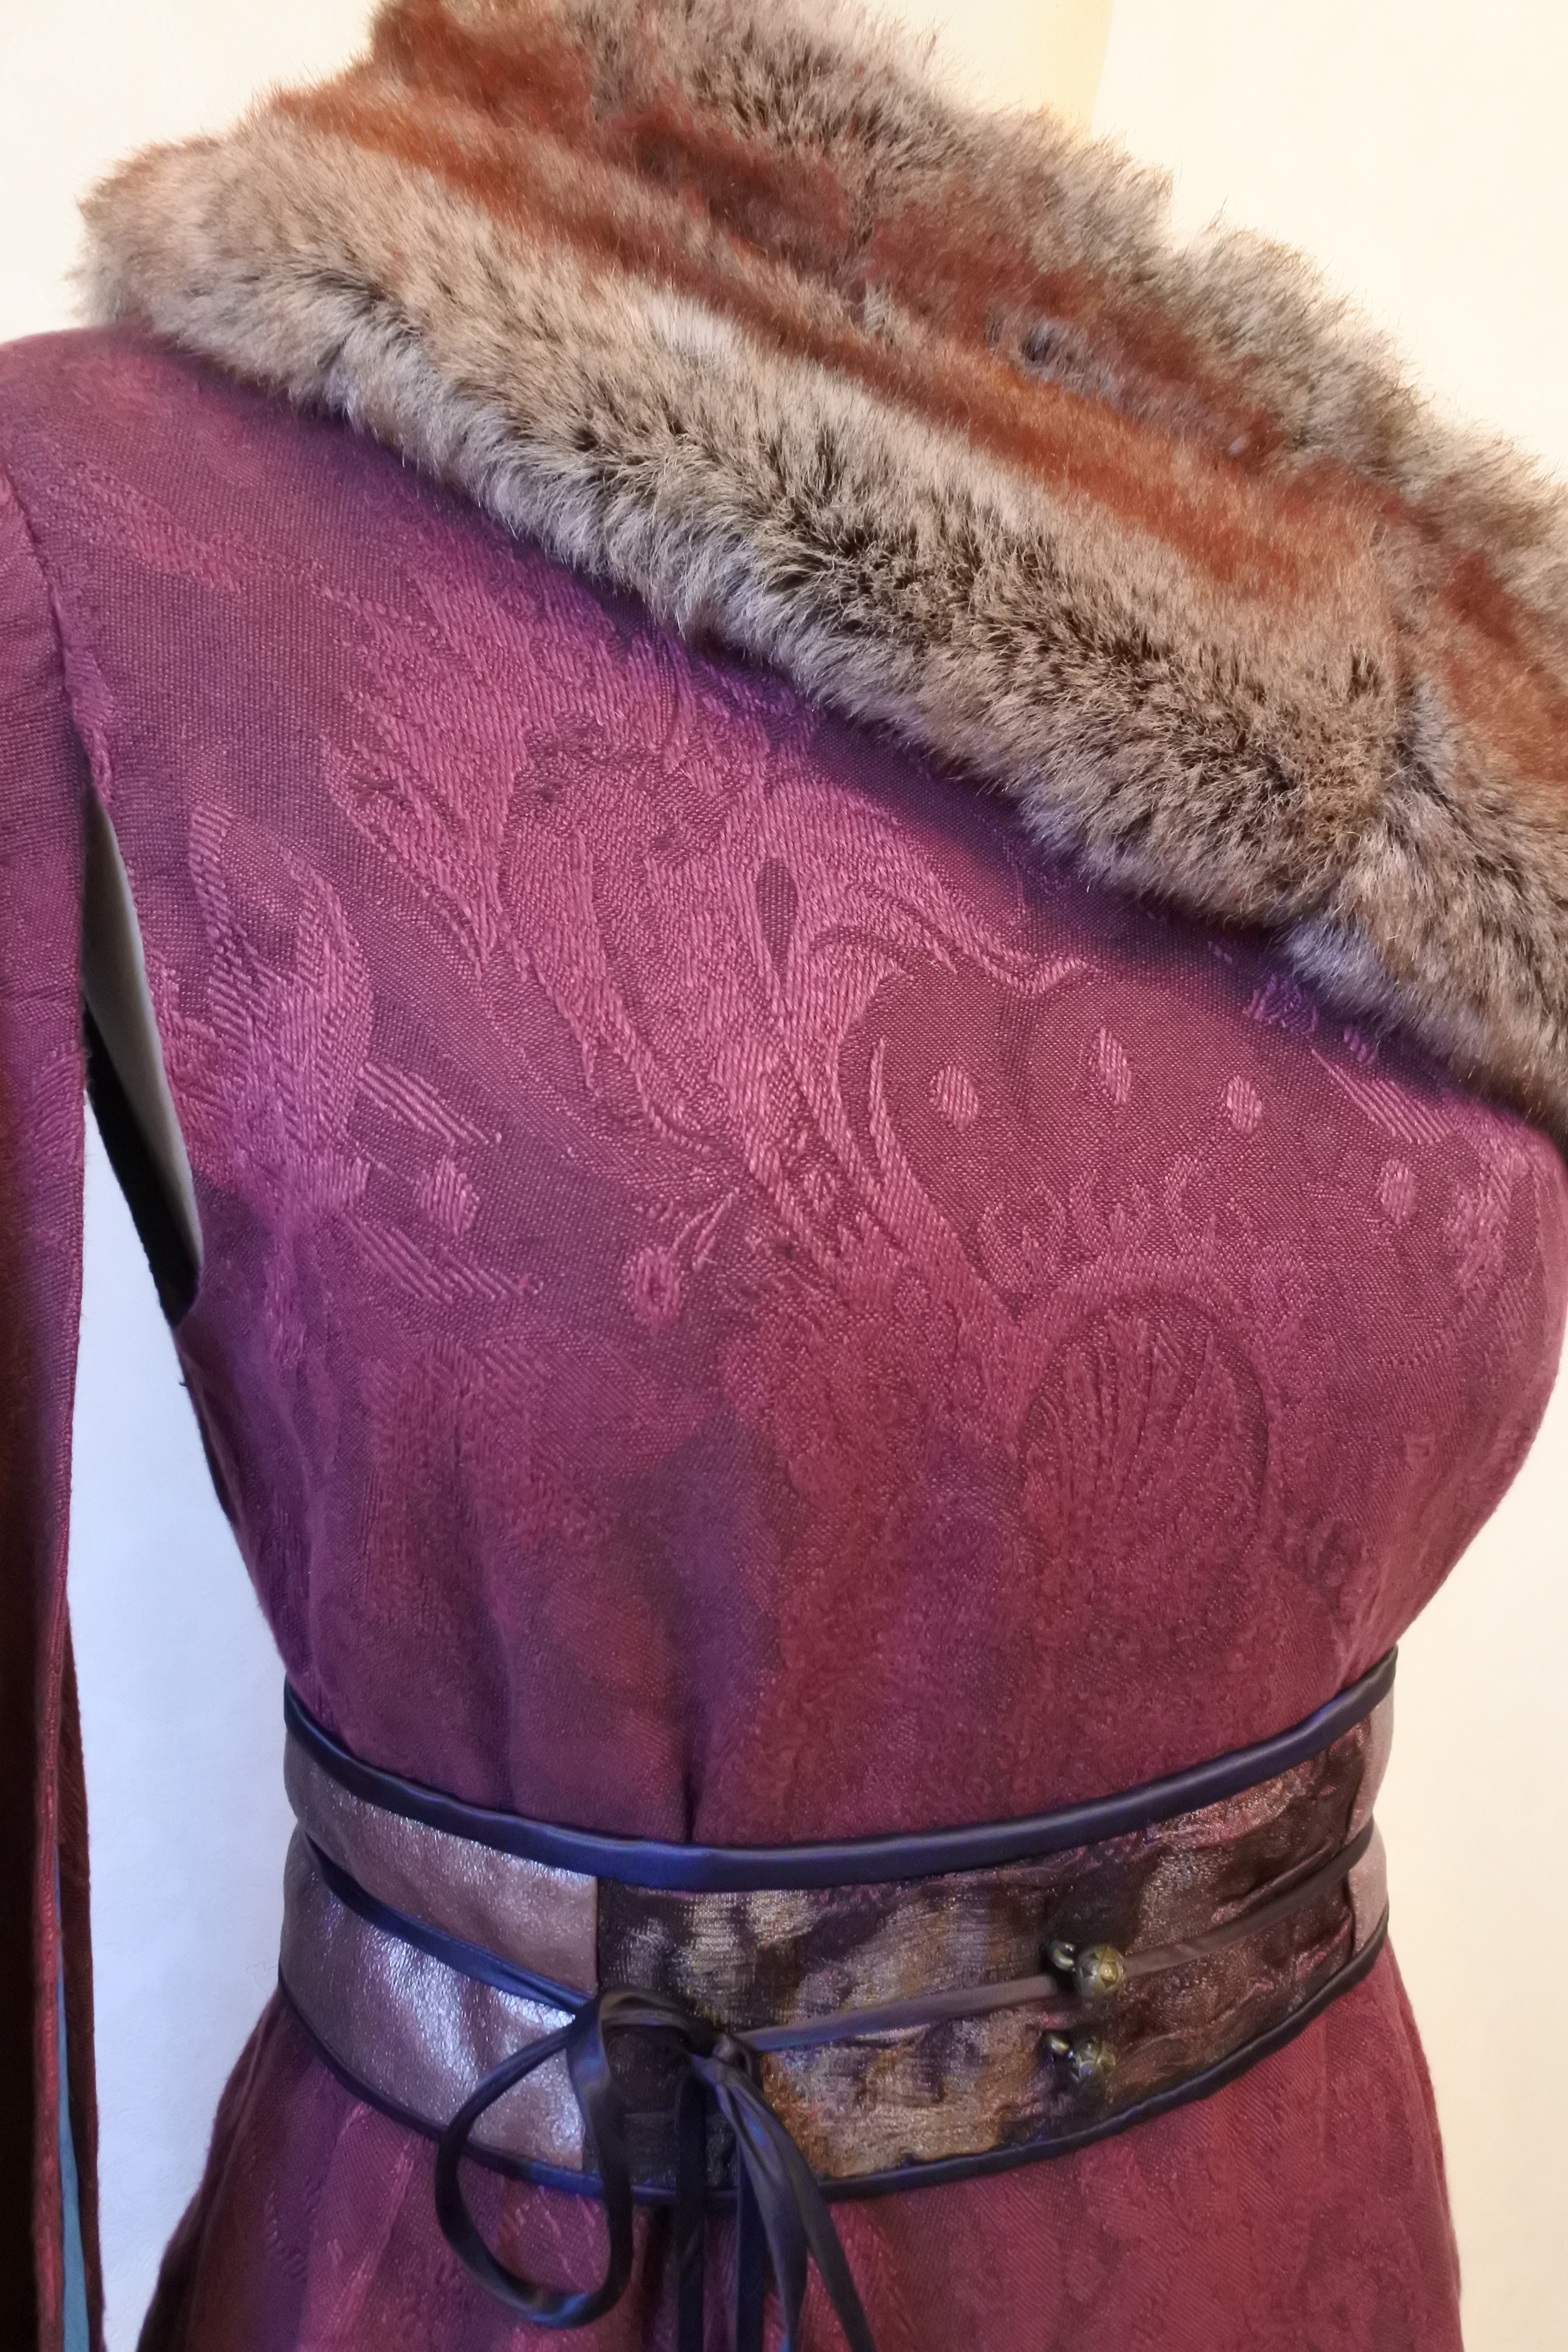 Fur collar and beaded waistband detail